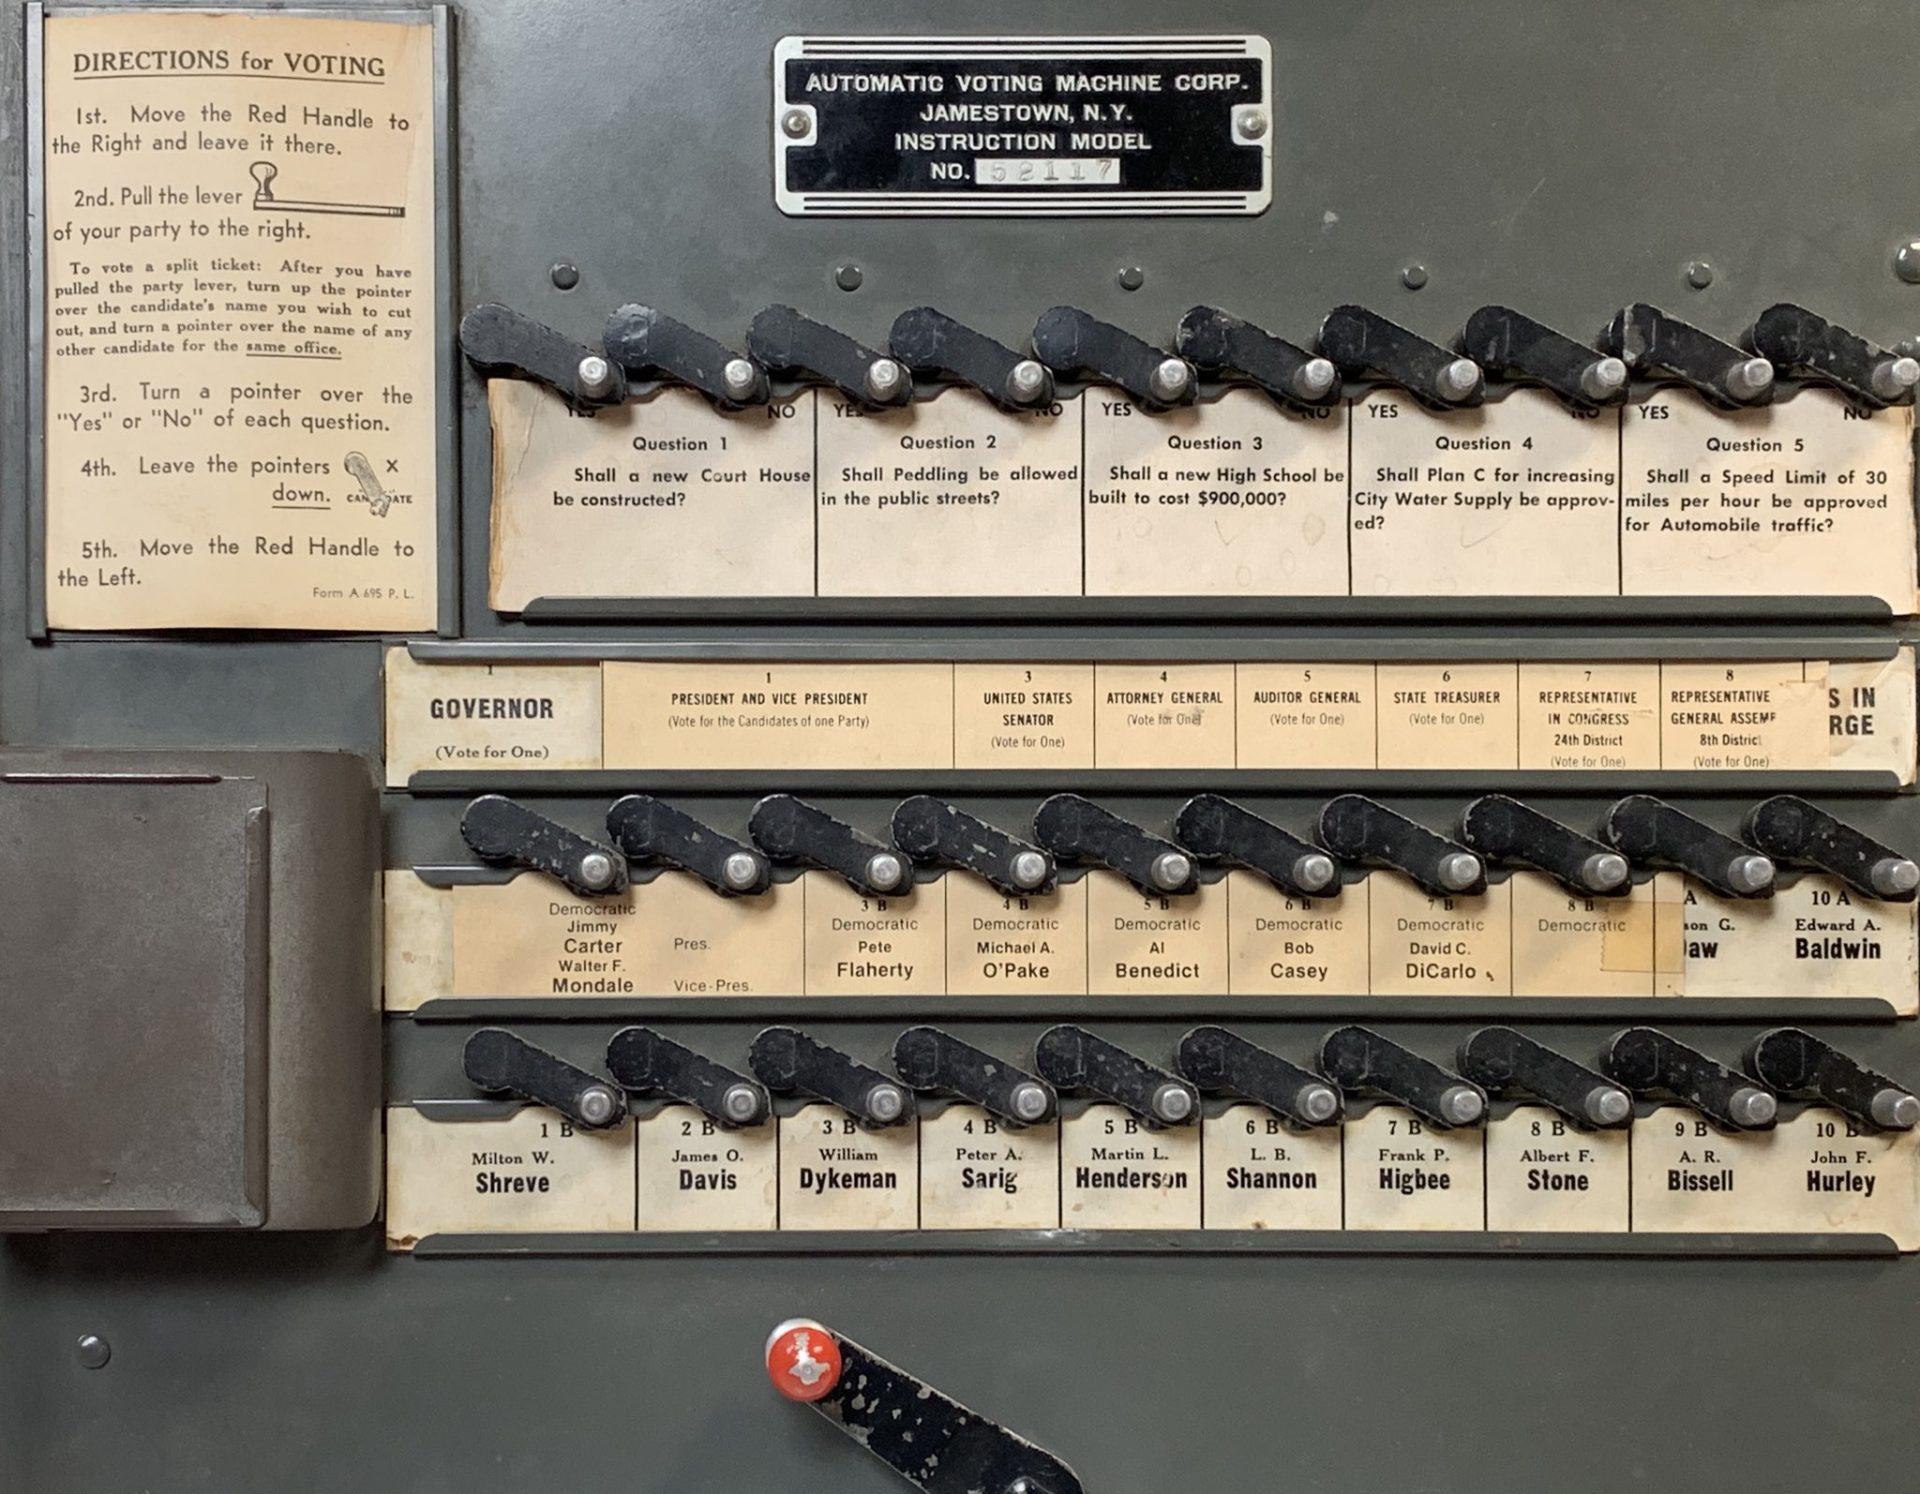 Old voting machine